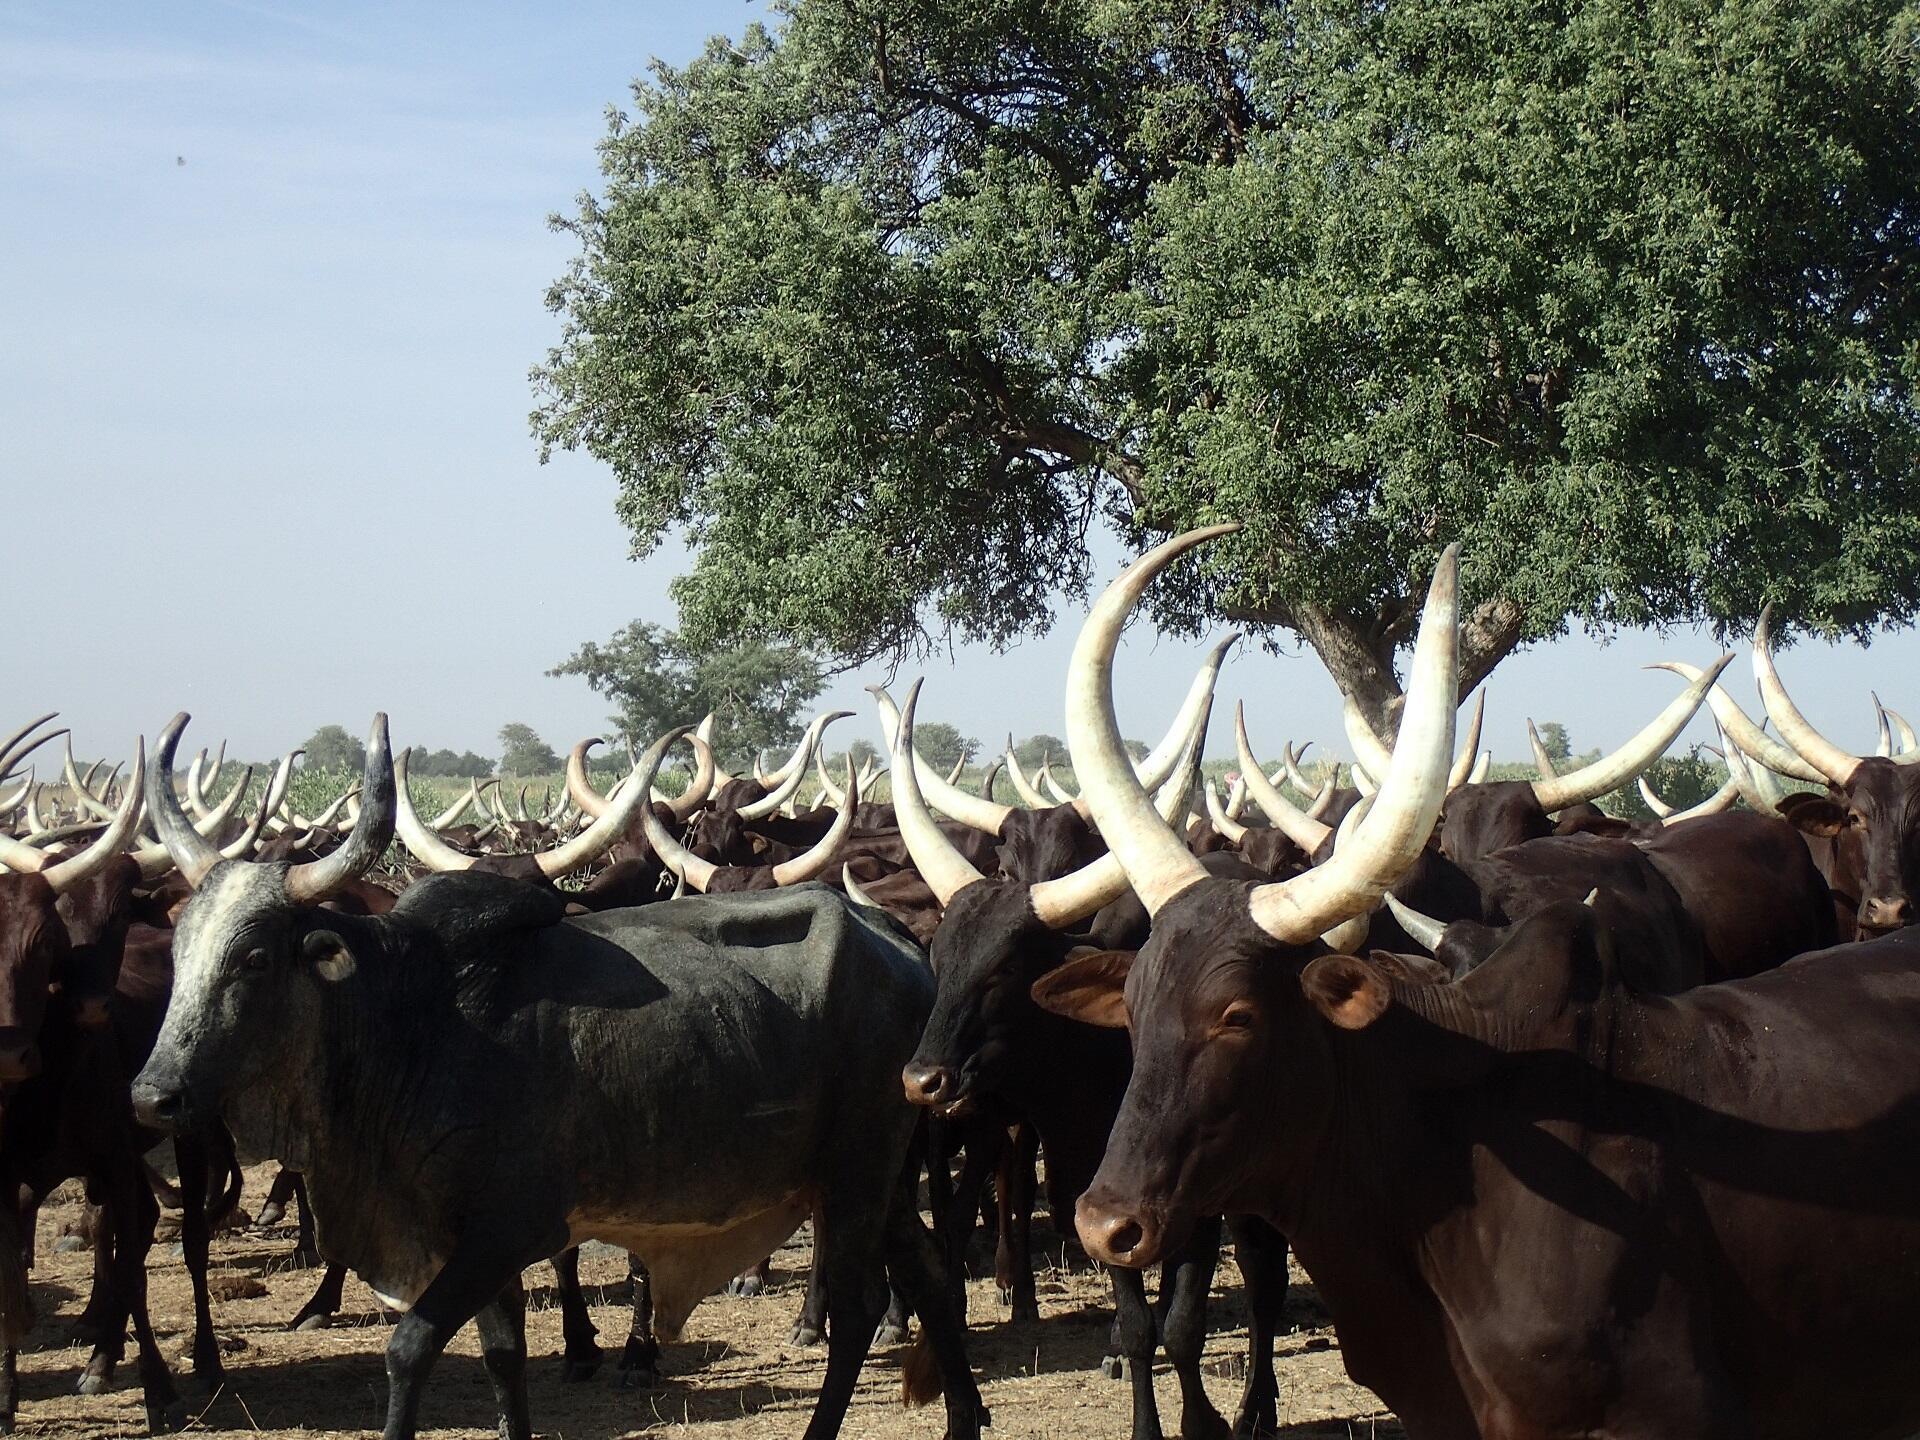 Les vaches M'Bororoji